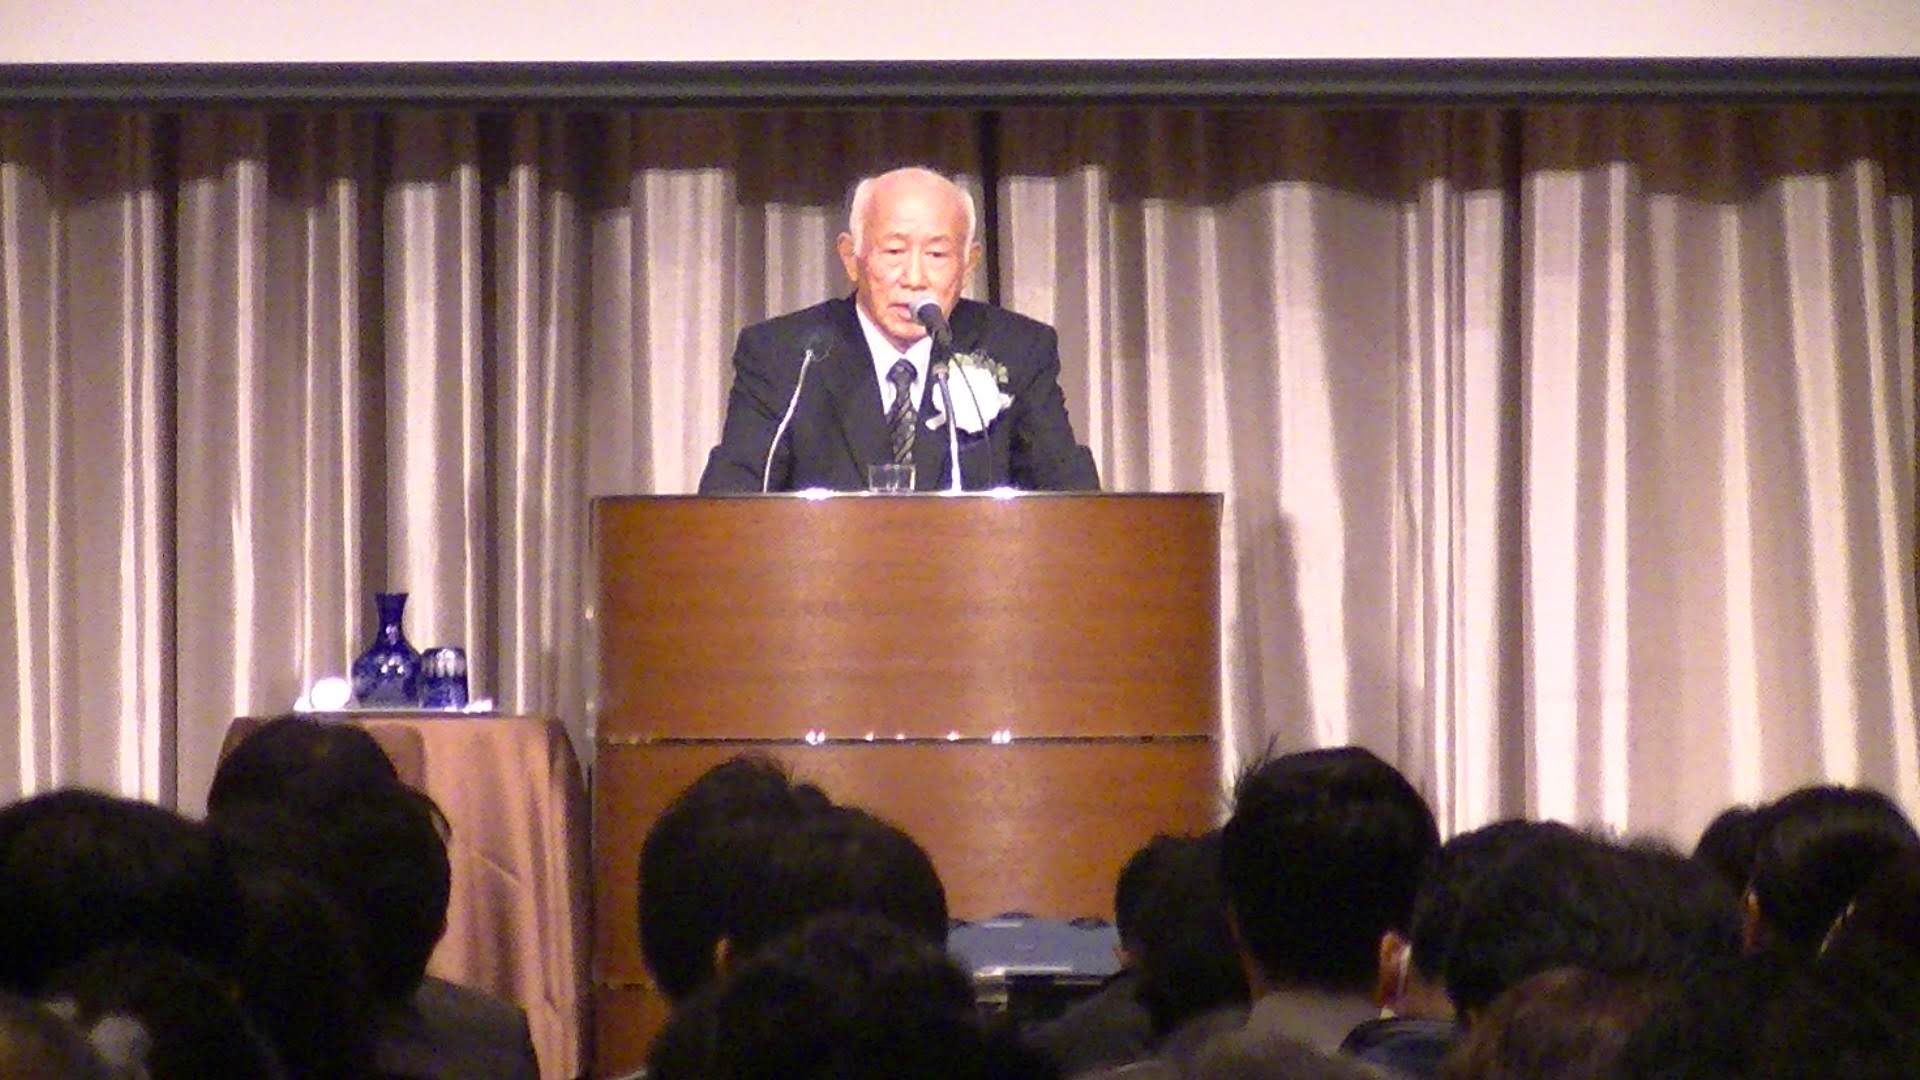 PIC 1673 1 - 思風会全国大会in広島